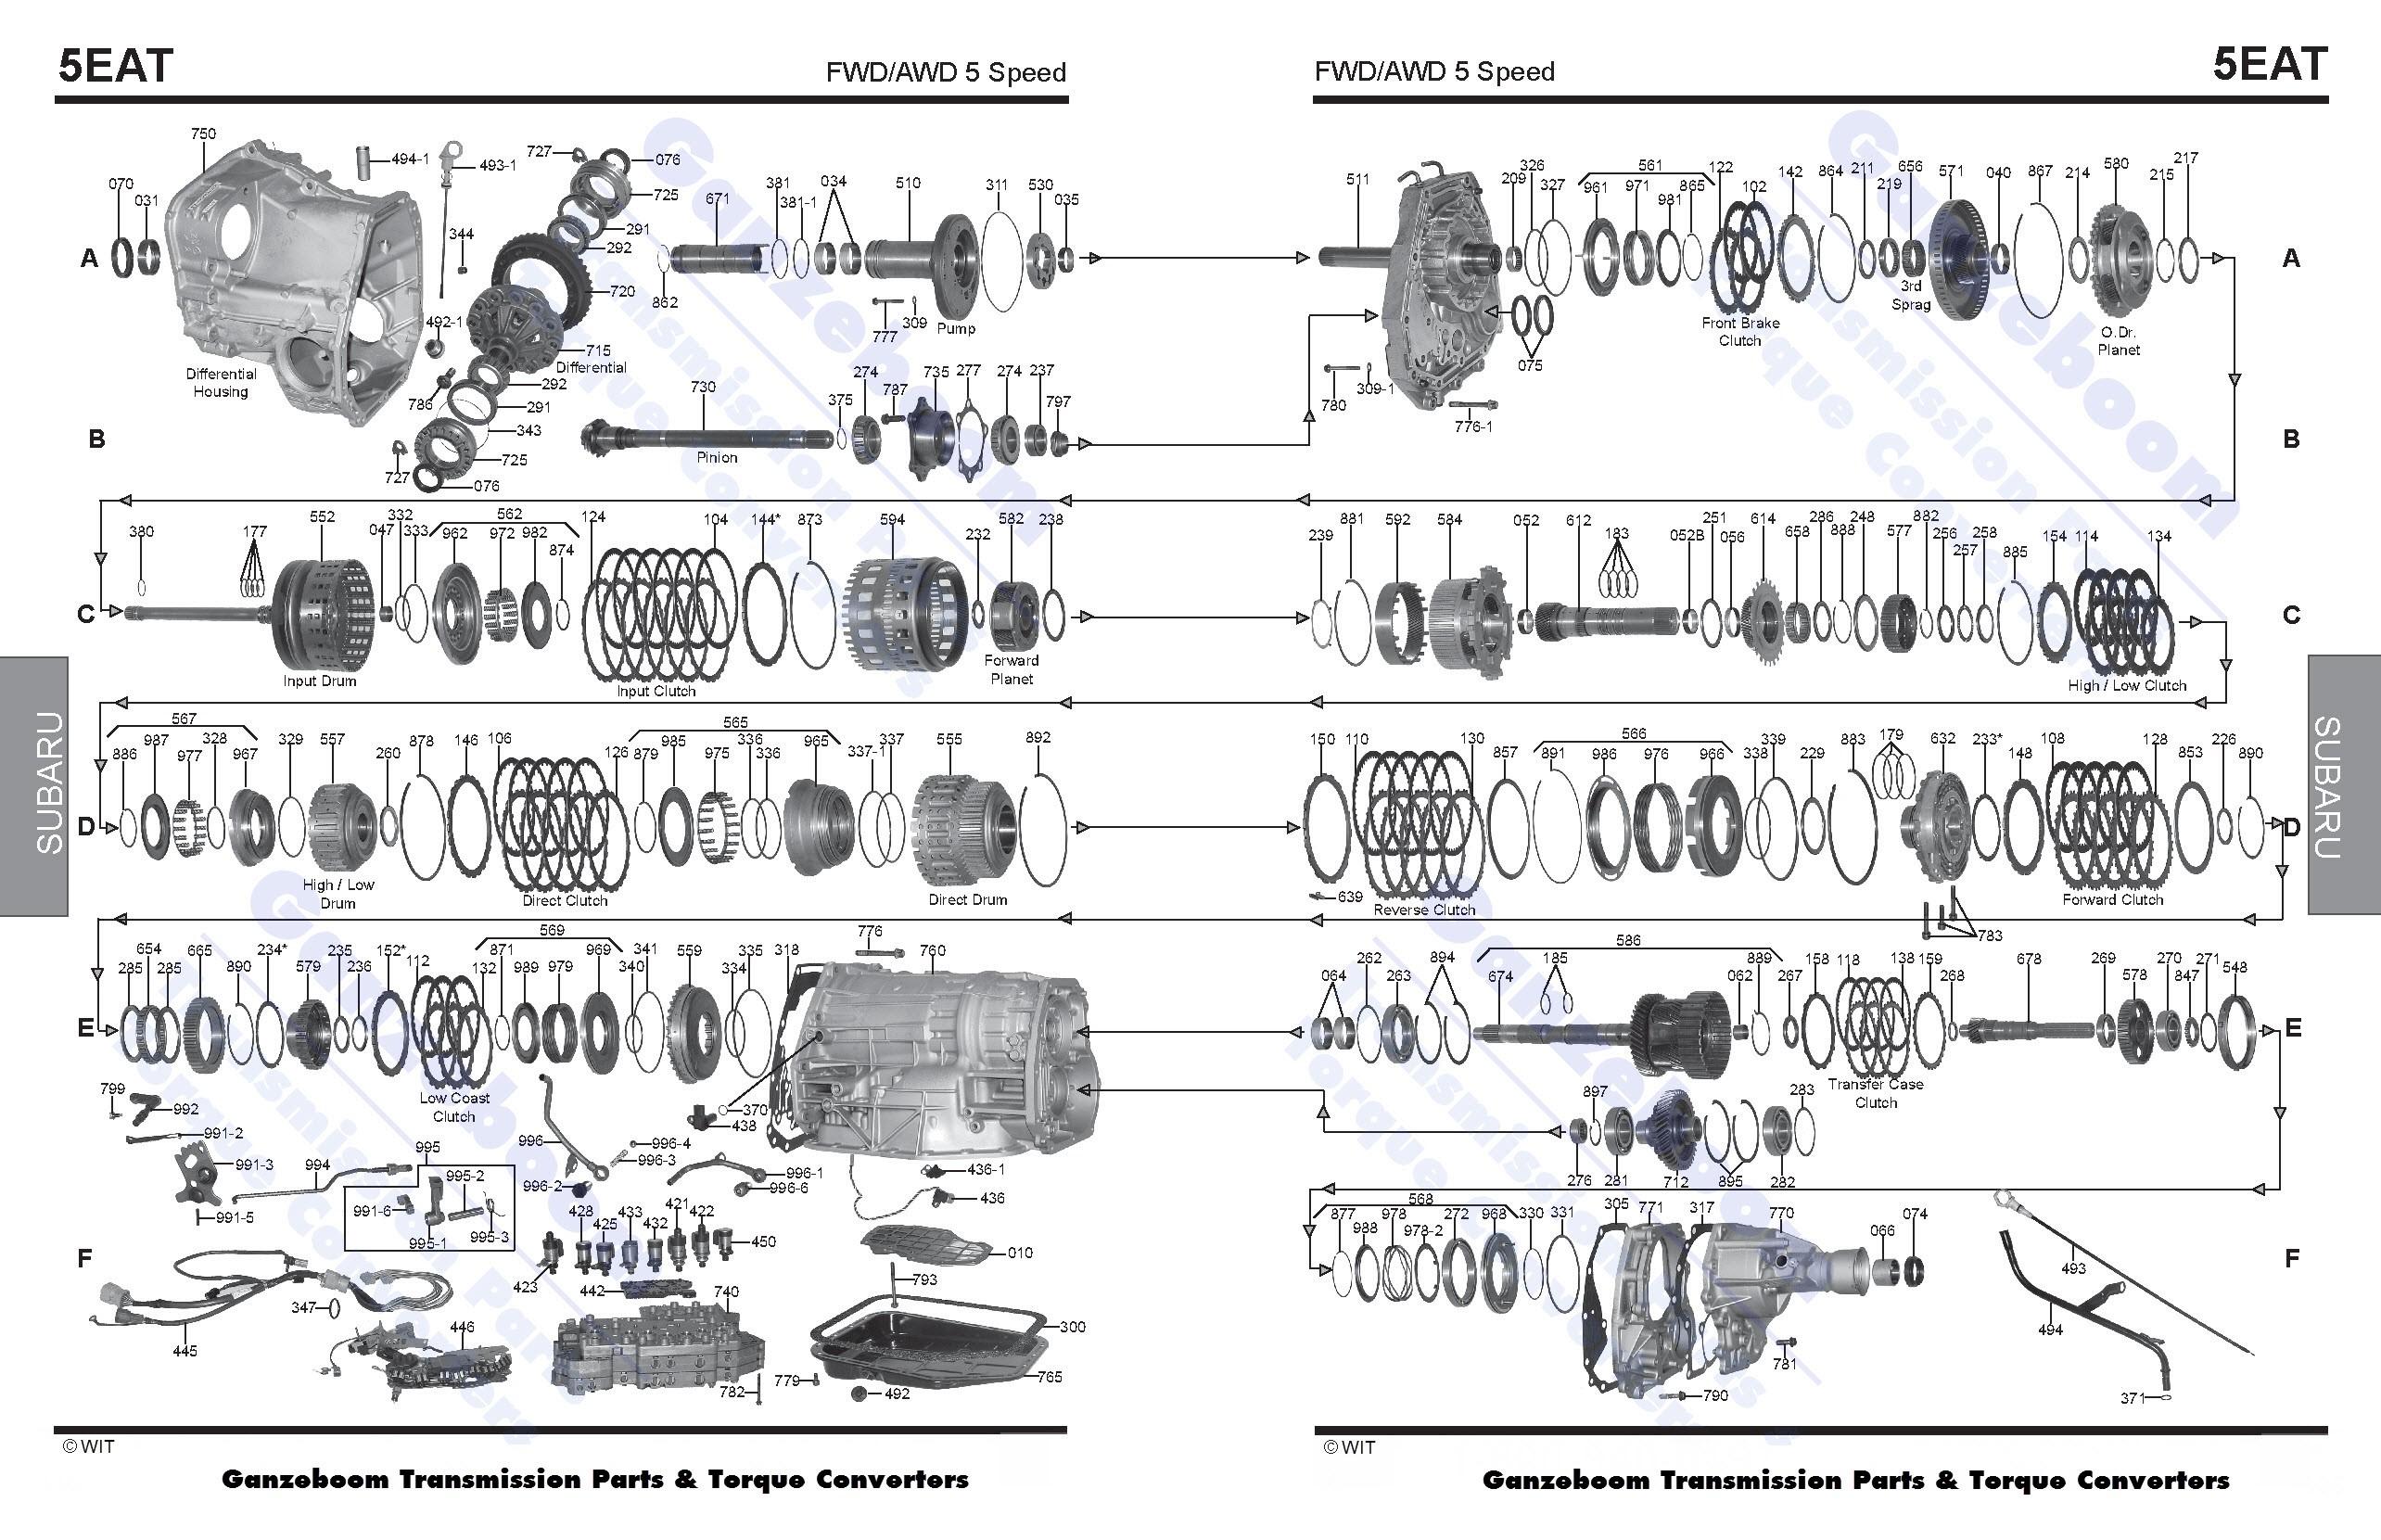 Subaru 5eat Subaru Parts Automatic Transmissions